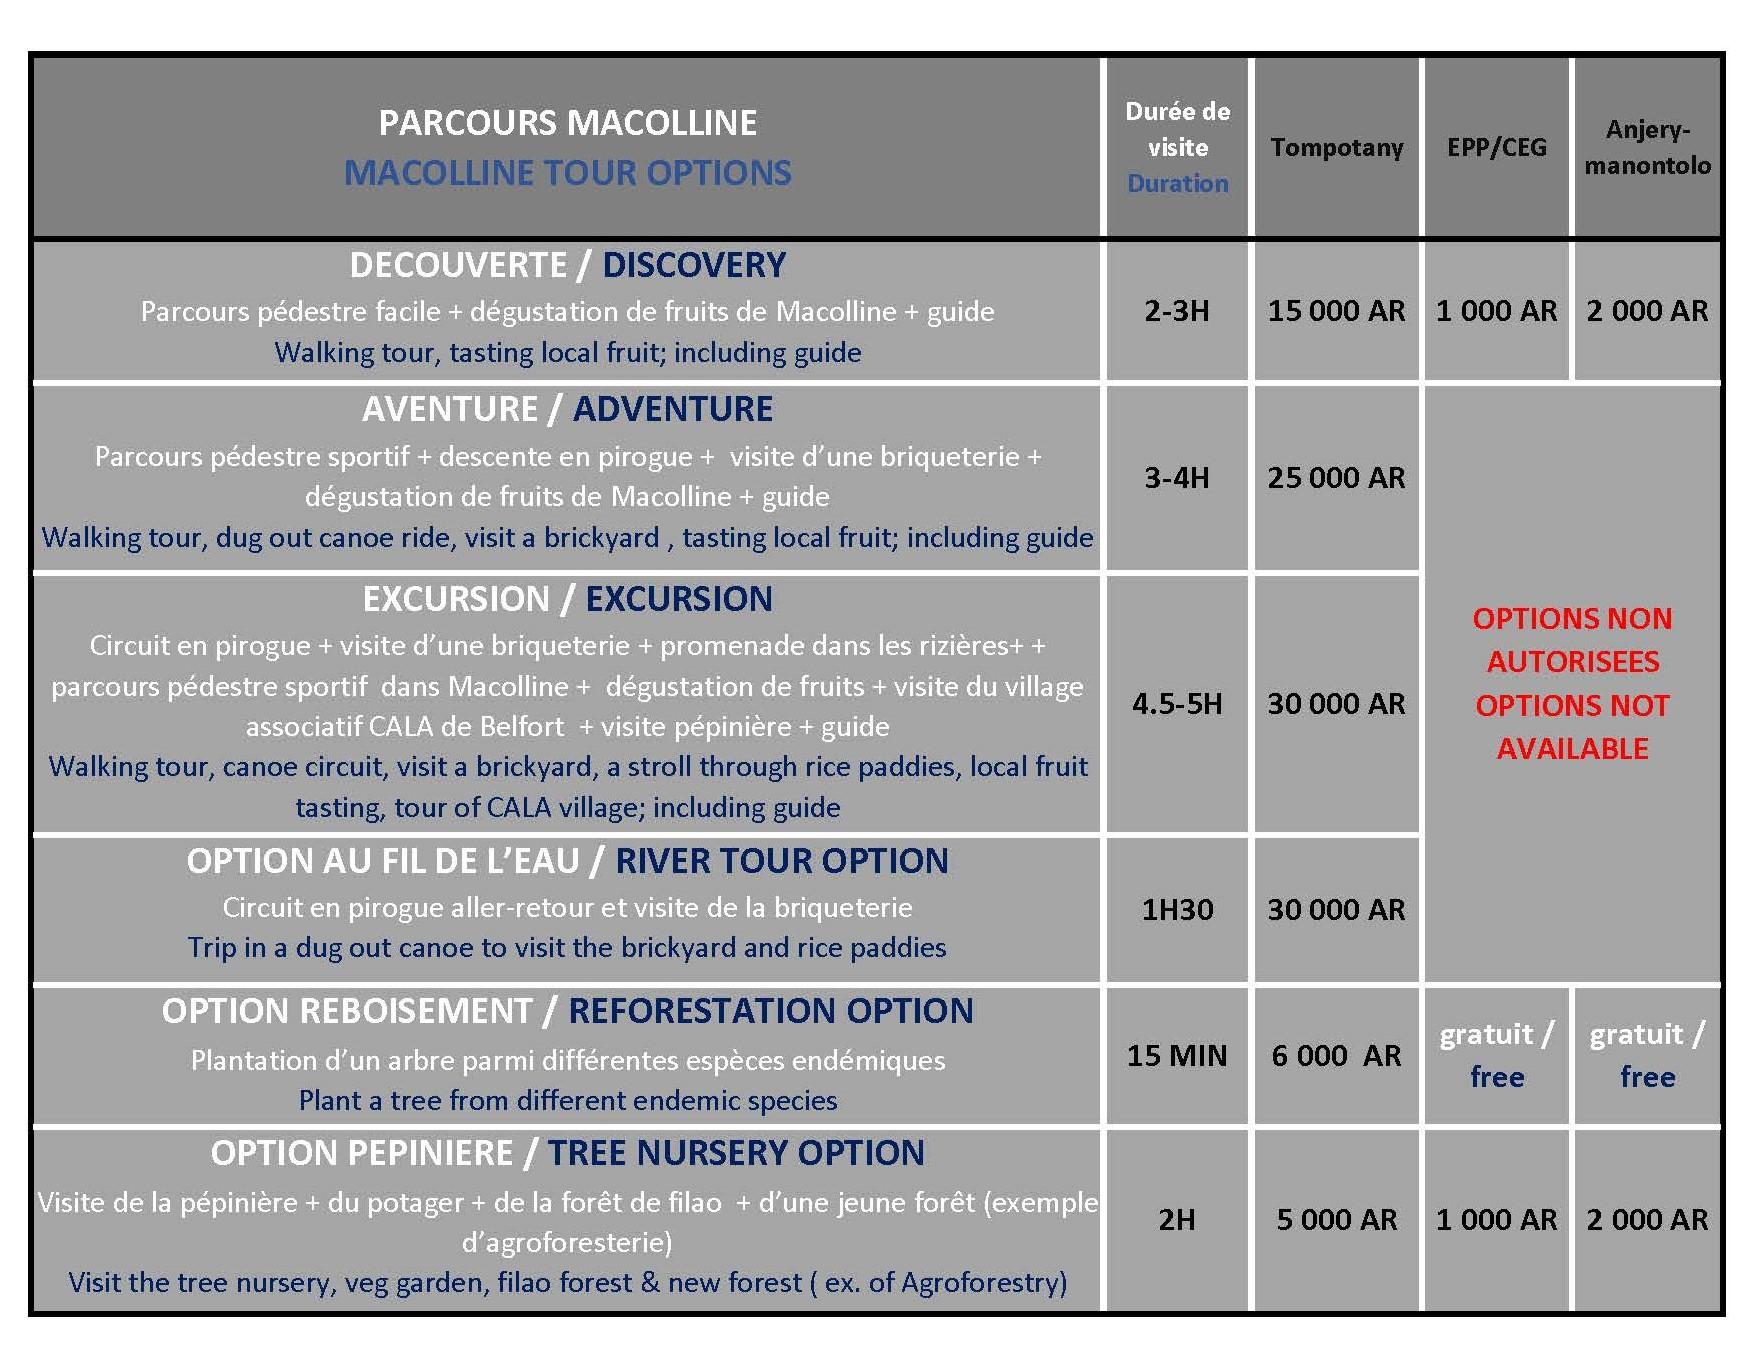 MACOLLINE flyer prices bilingual 2020 students